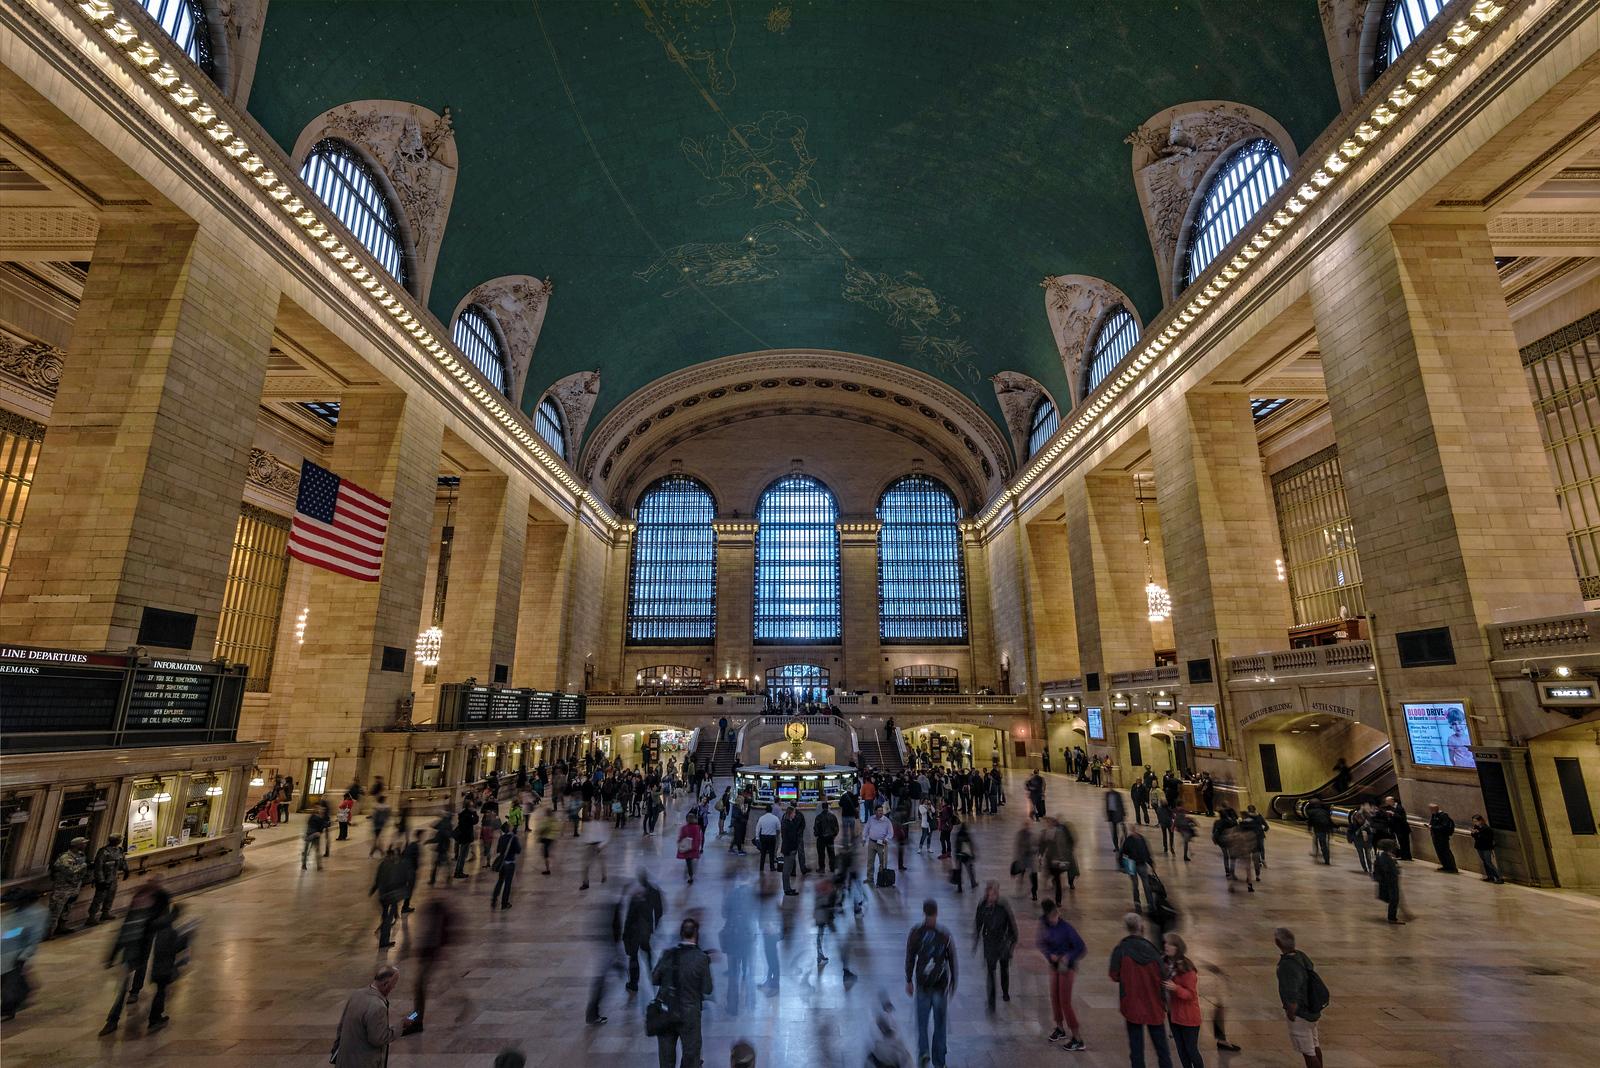 Grand Central Station (New York City)